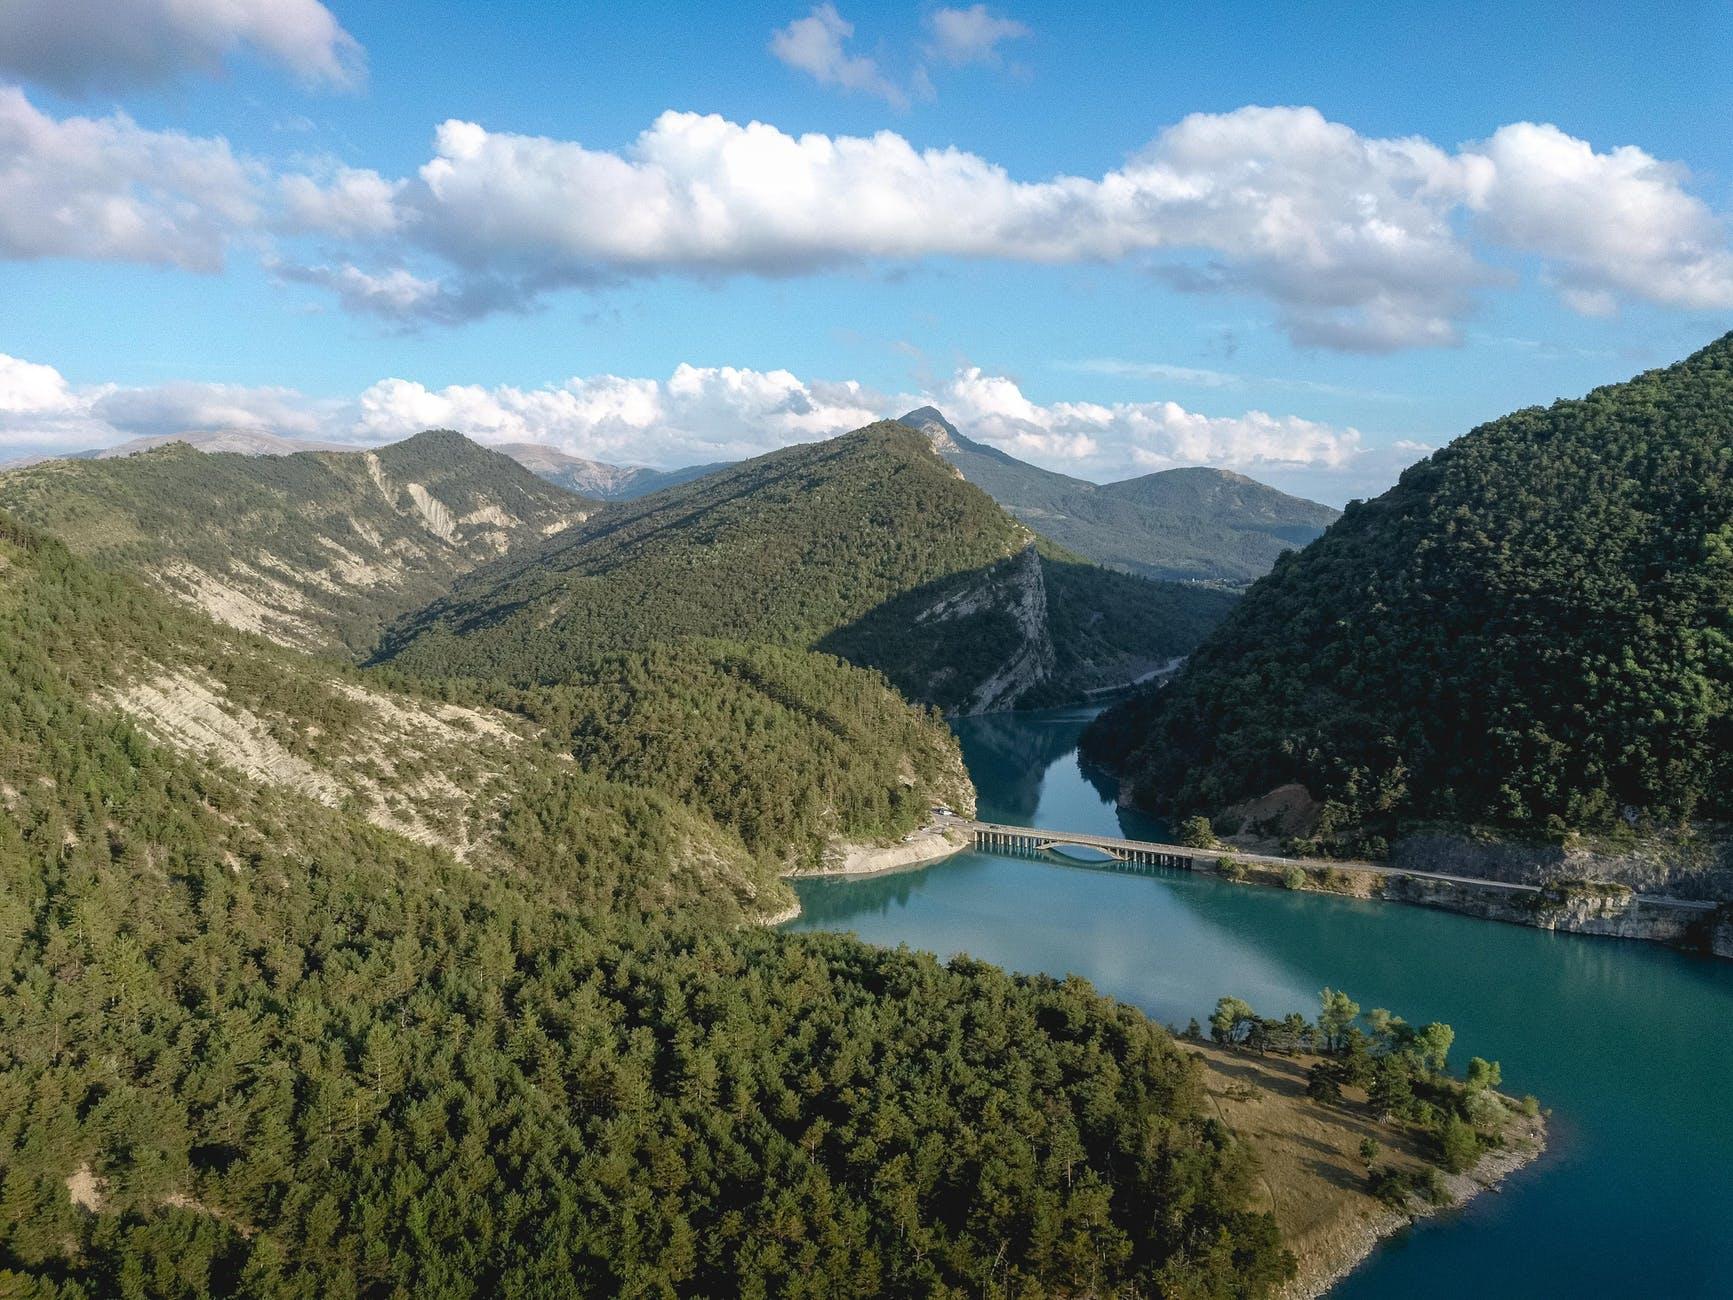 green mountains near lake under blue sky